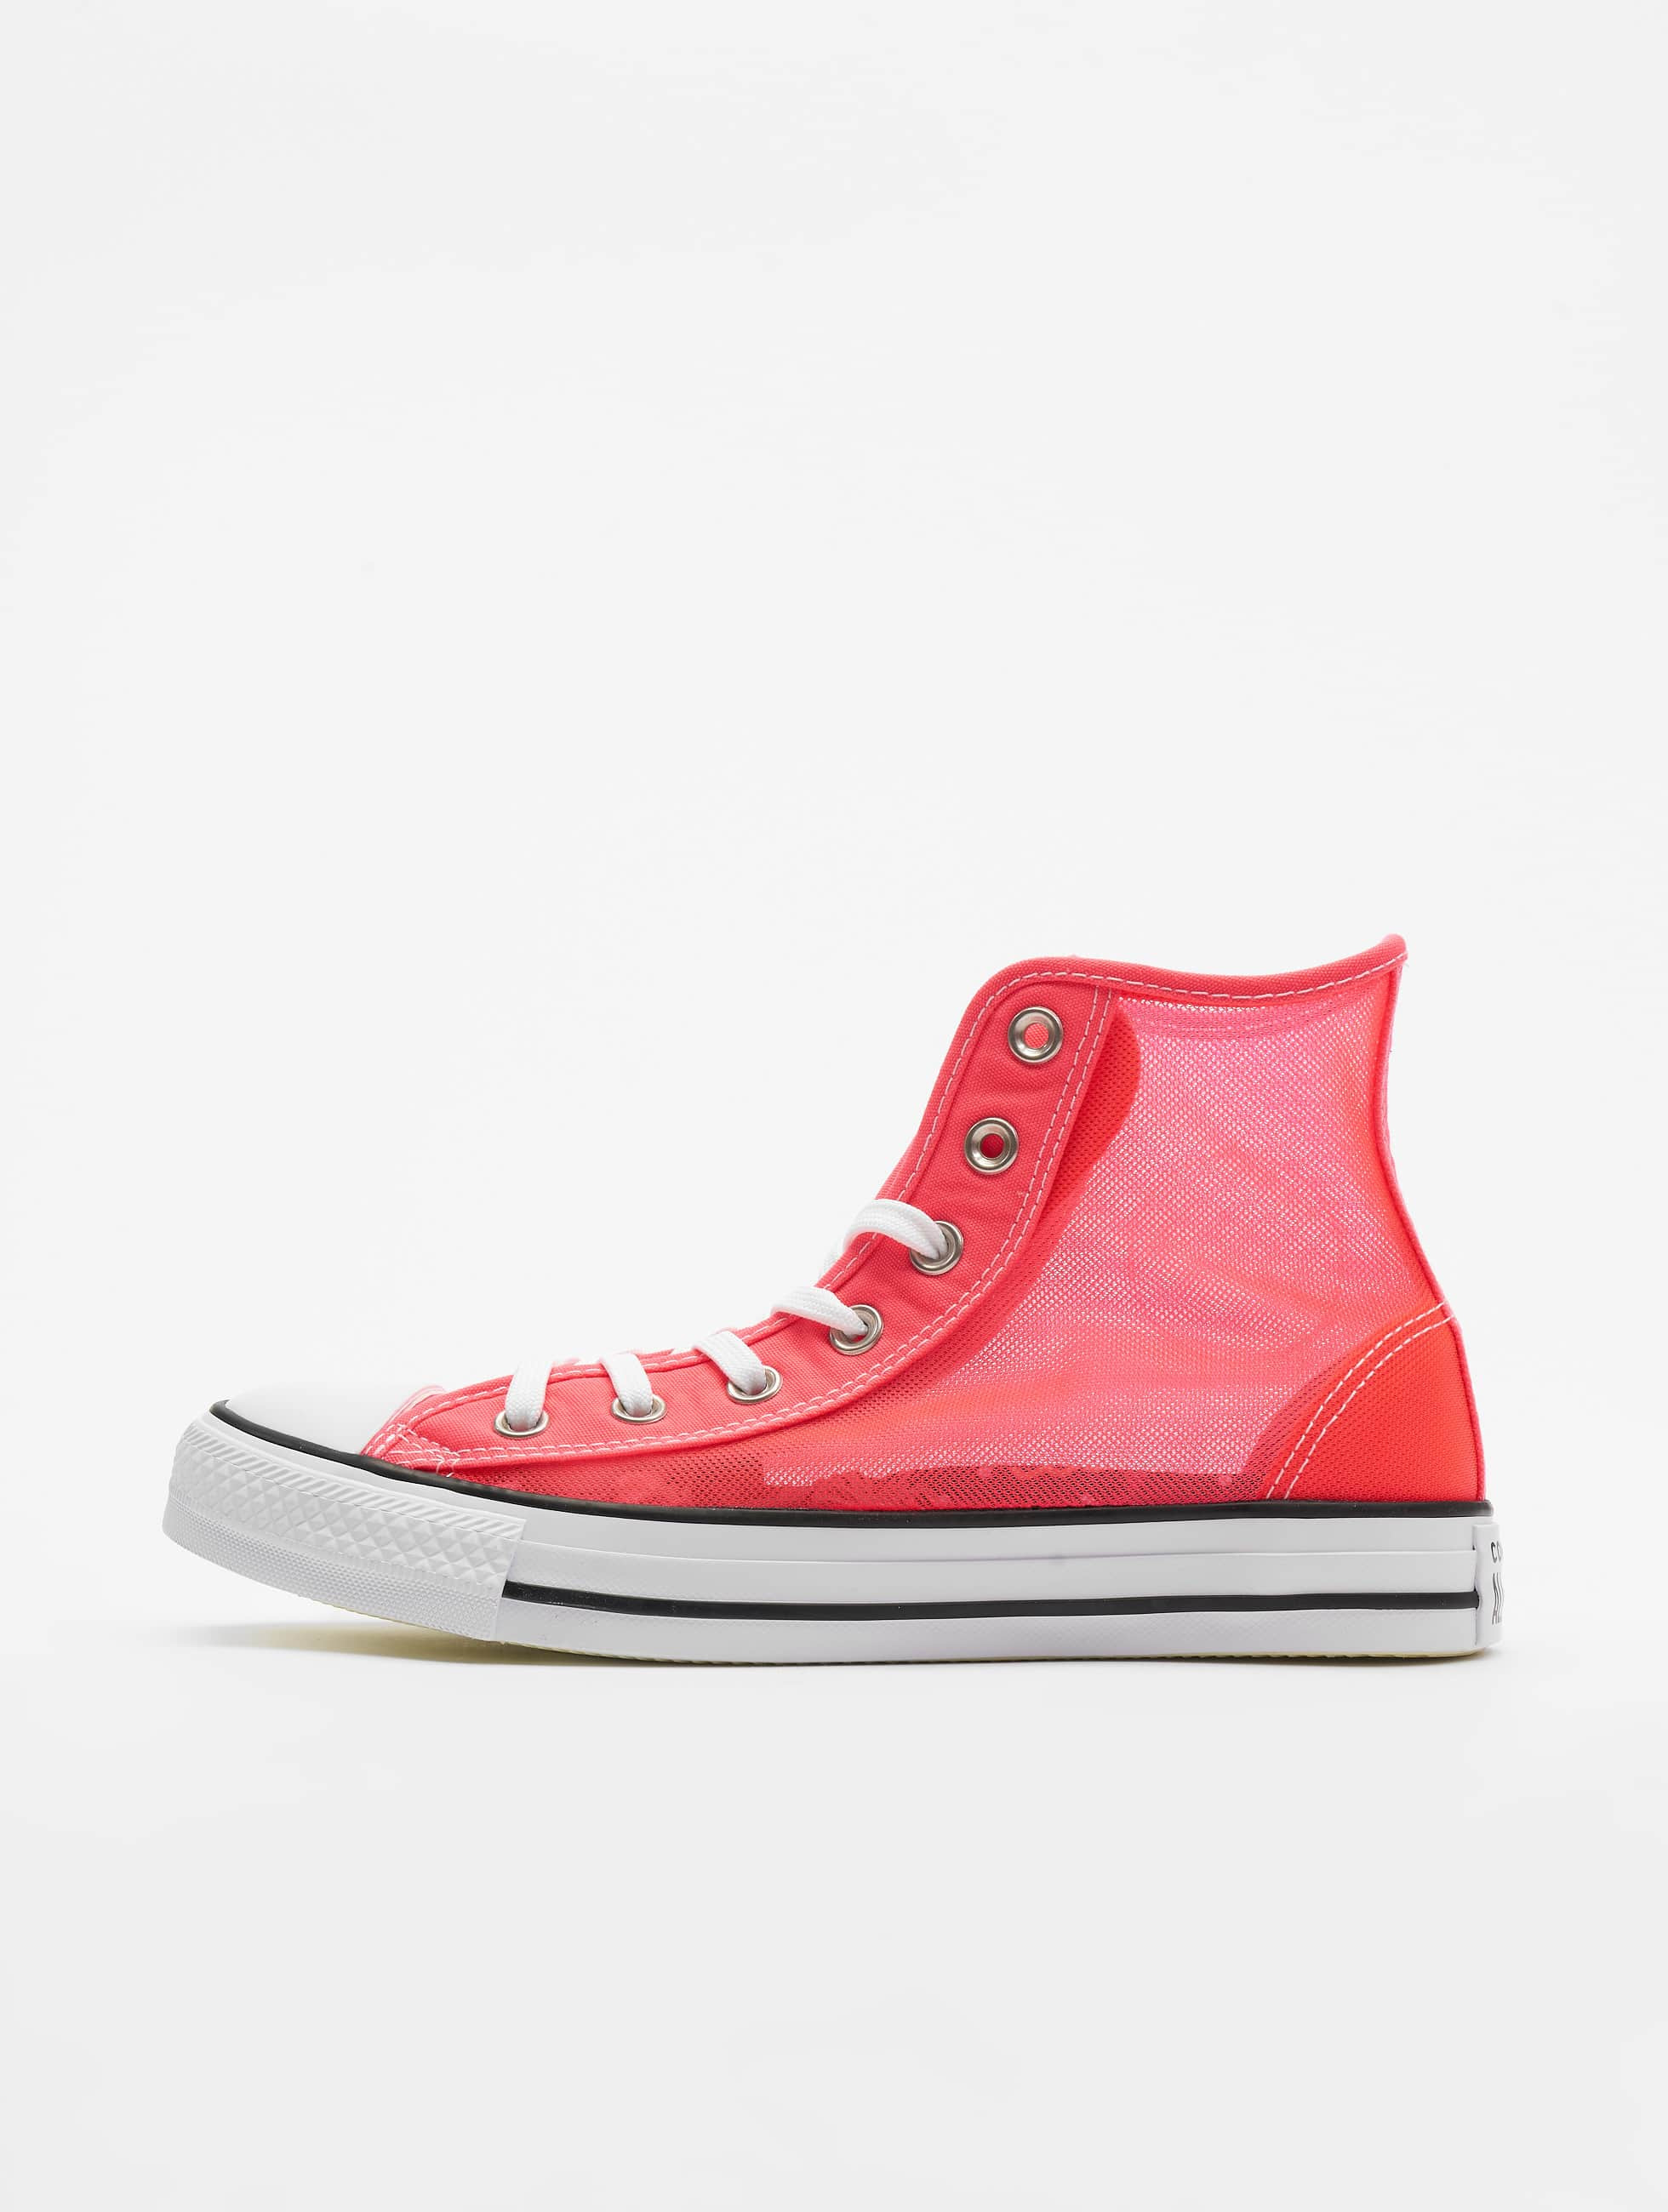 Converse Chuck Tailor All Star Hi Sneakers Racer PinkWhiteBlack